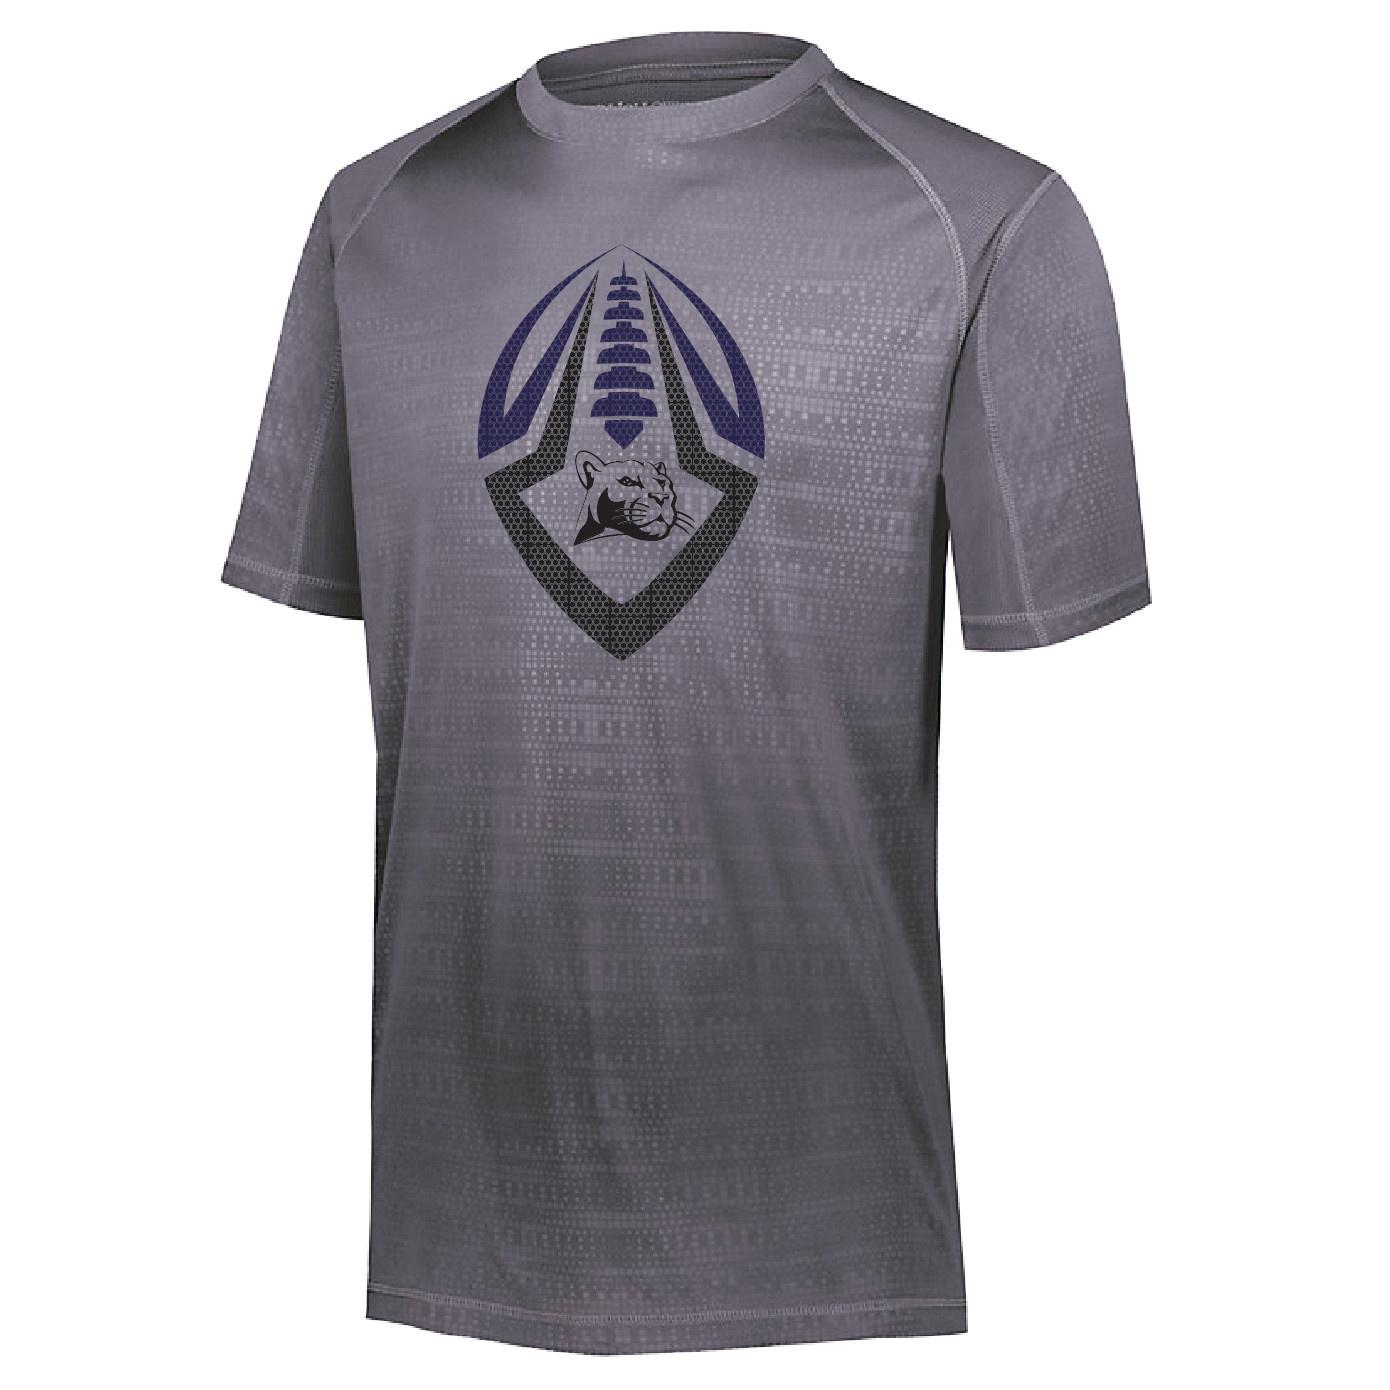 Holloway Holloway Converge Wicking Shirt (Grey)